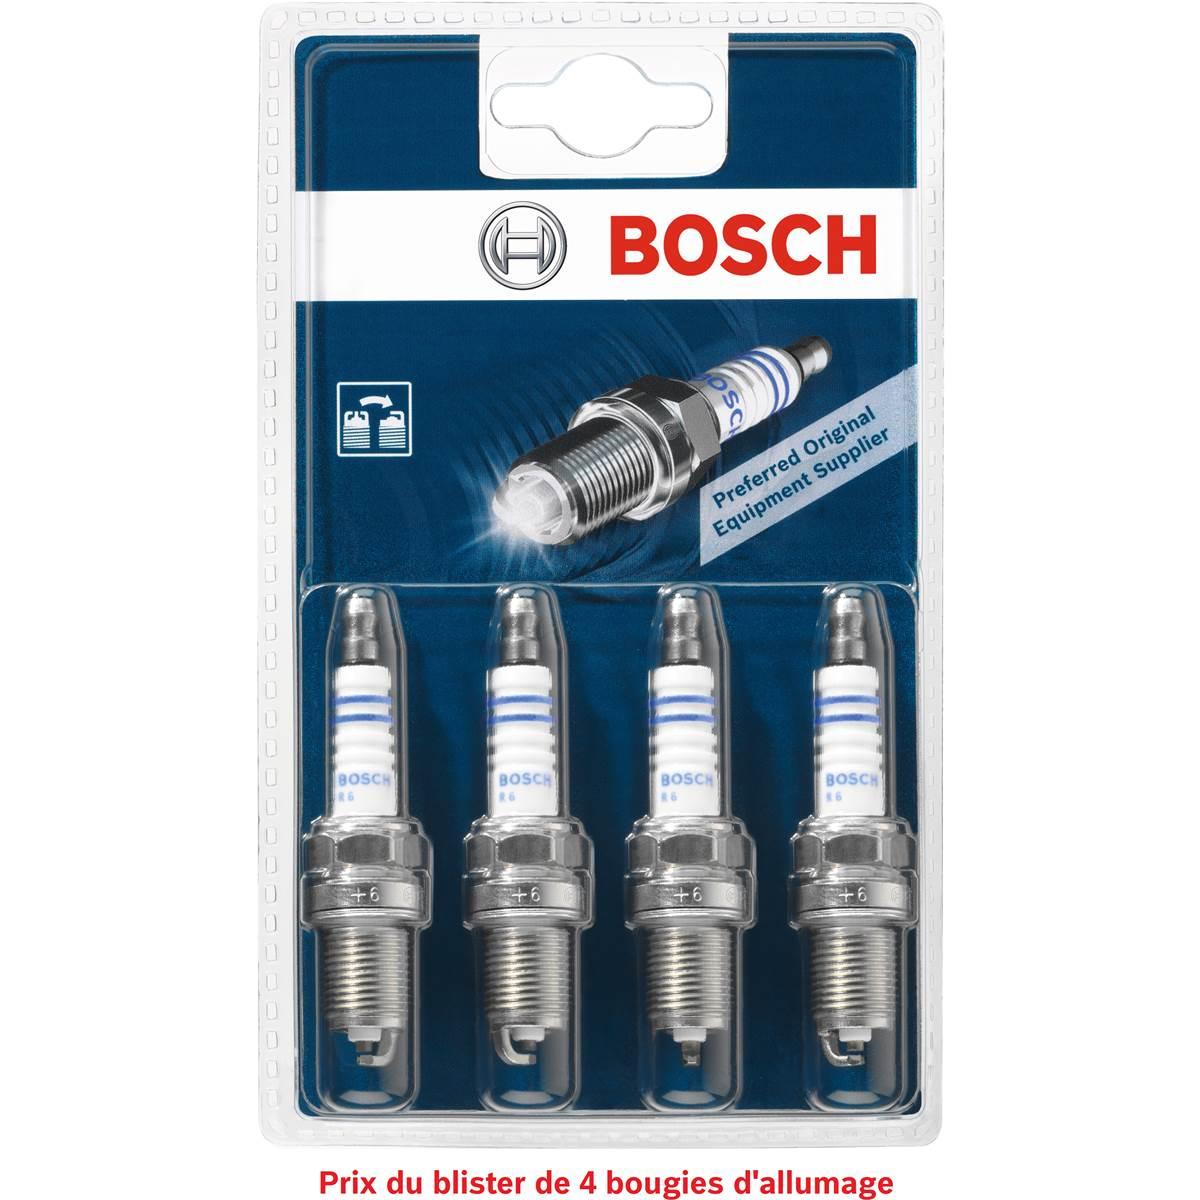 Bougies d'allumage Bosch N°6